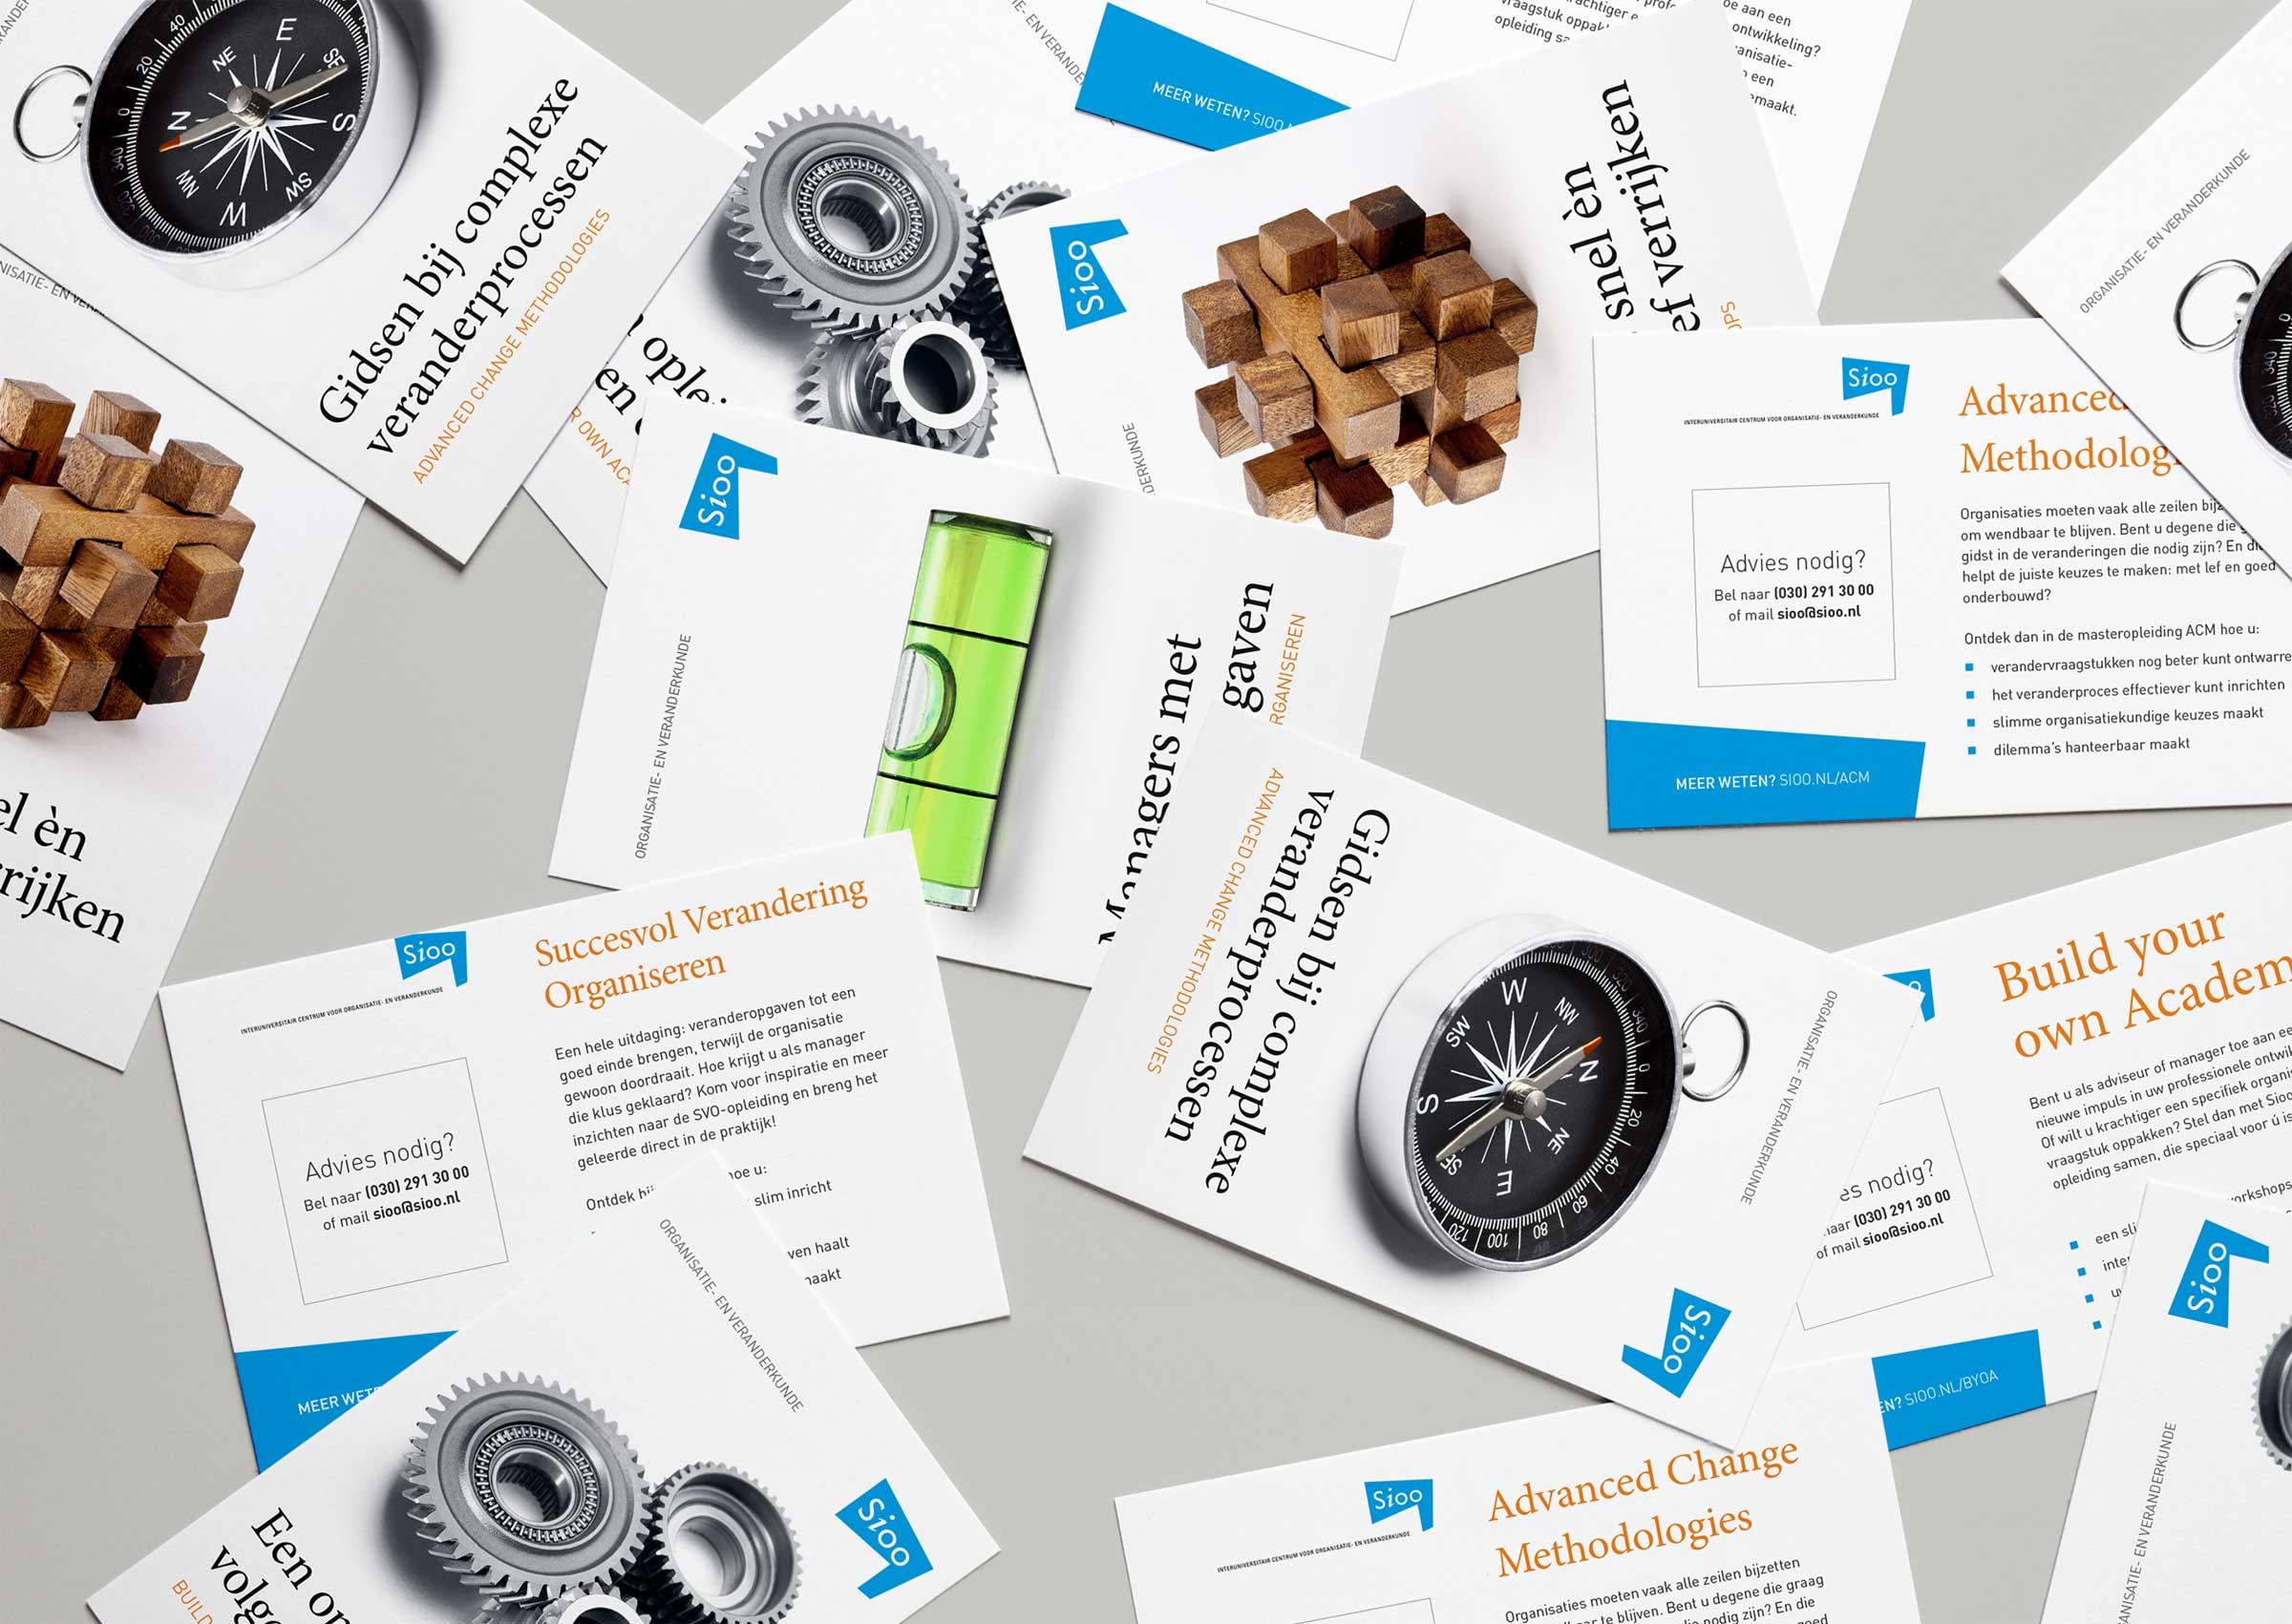 onlinemagazine_dutchgiraffe_sioo_cards